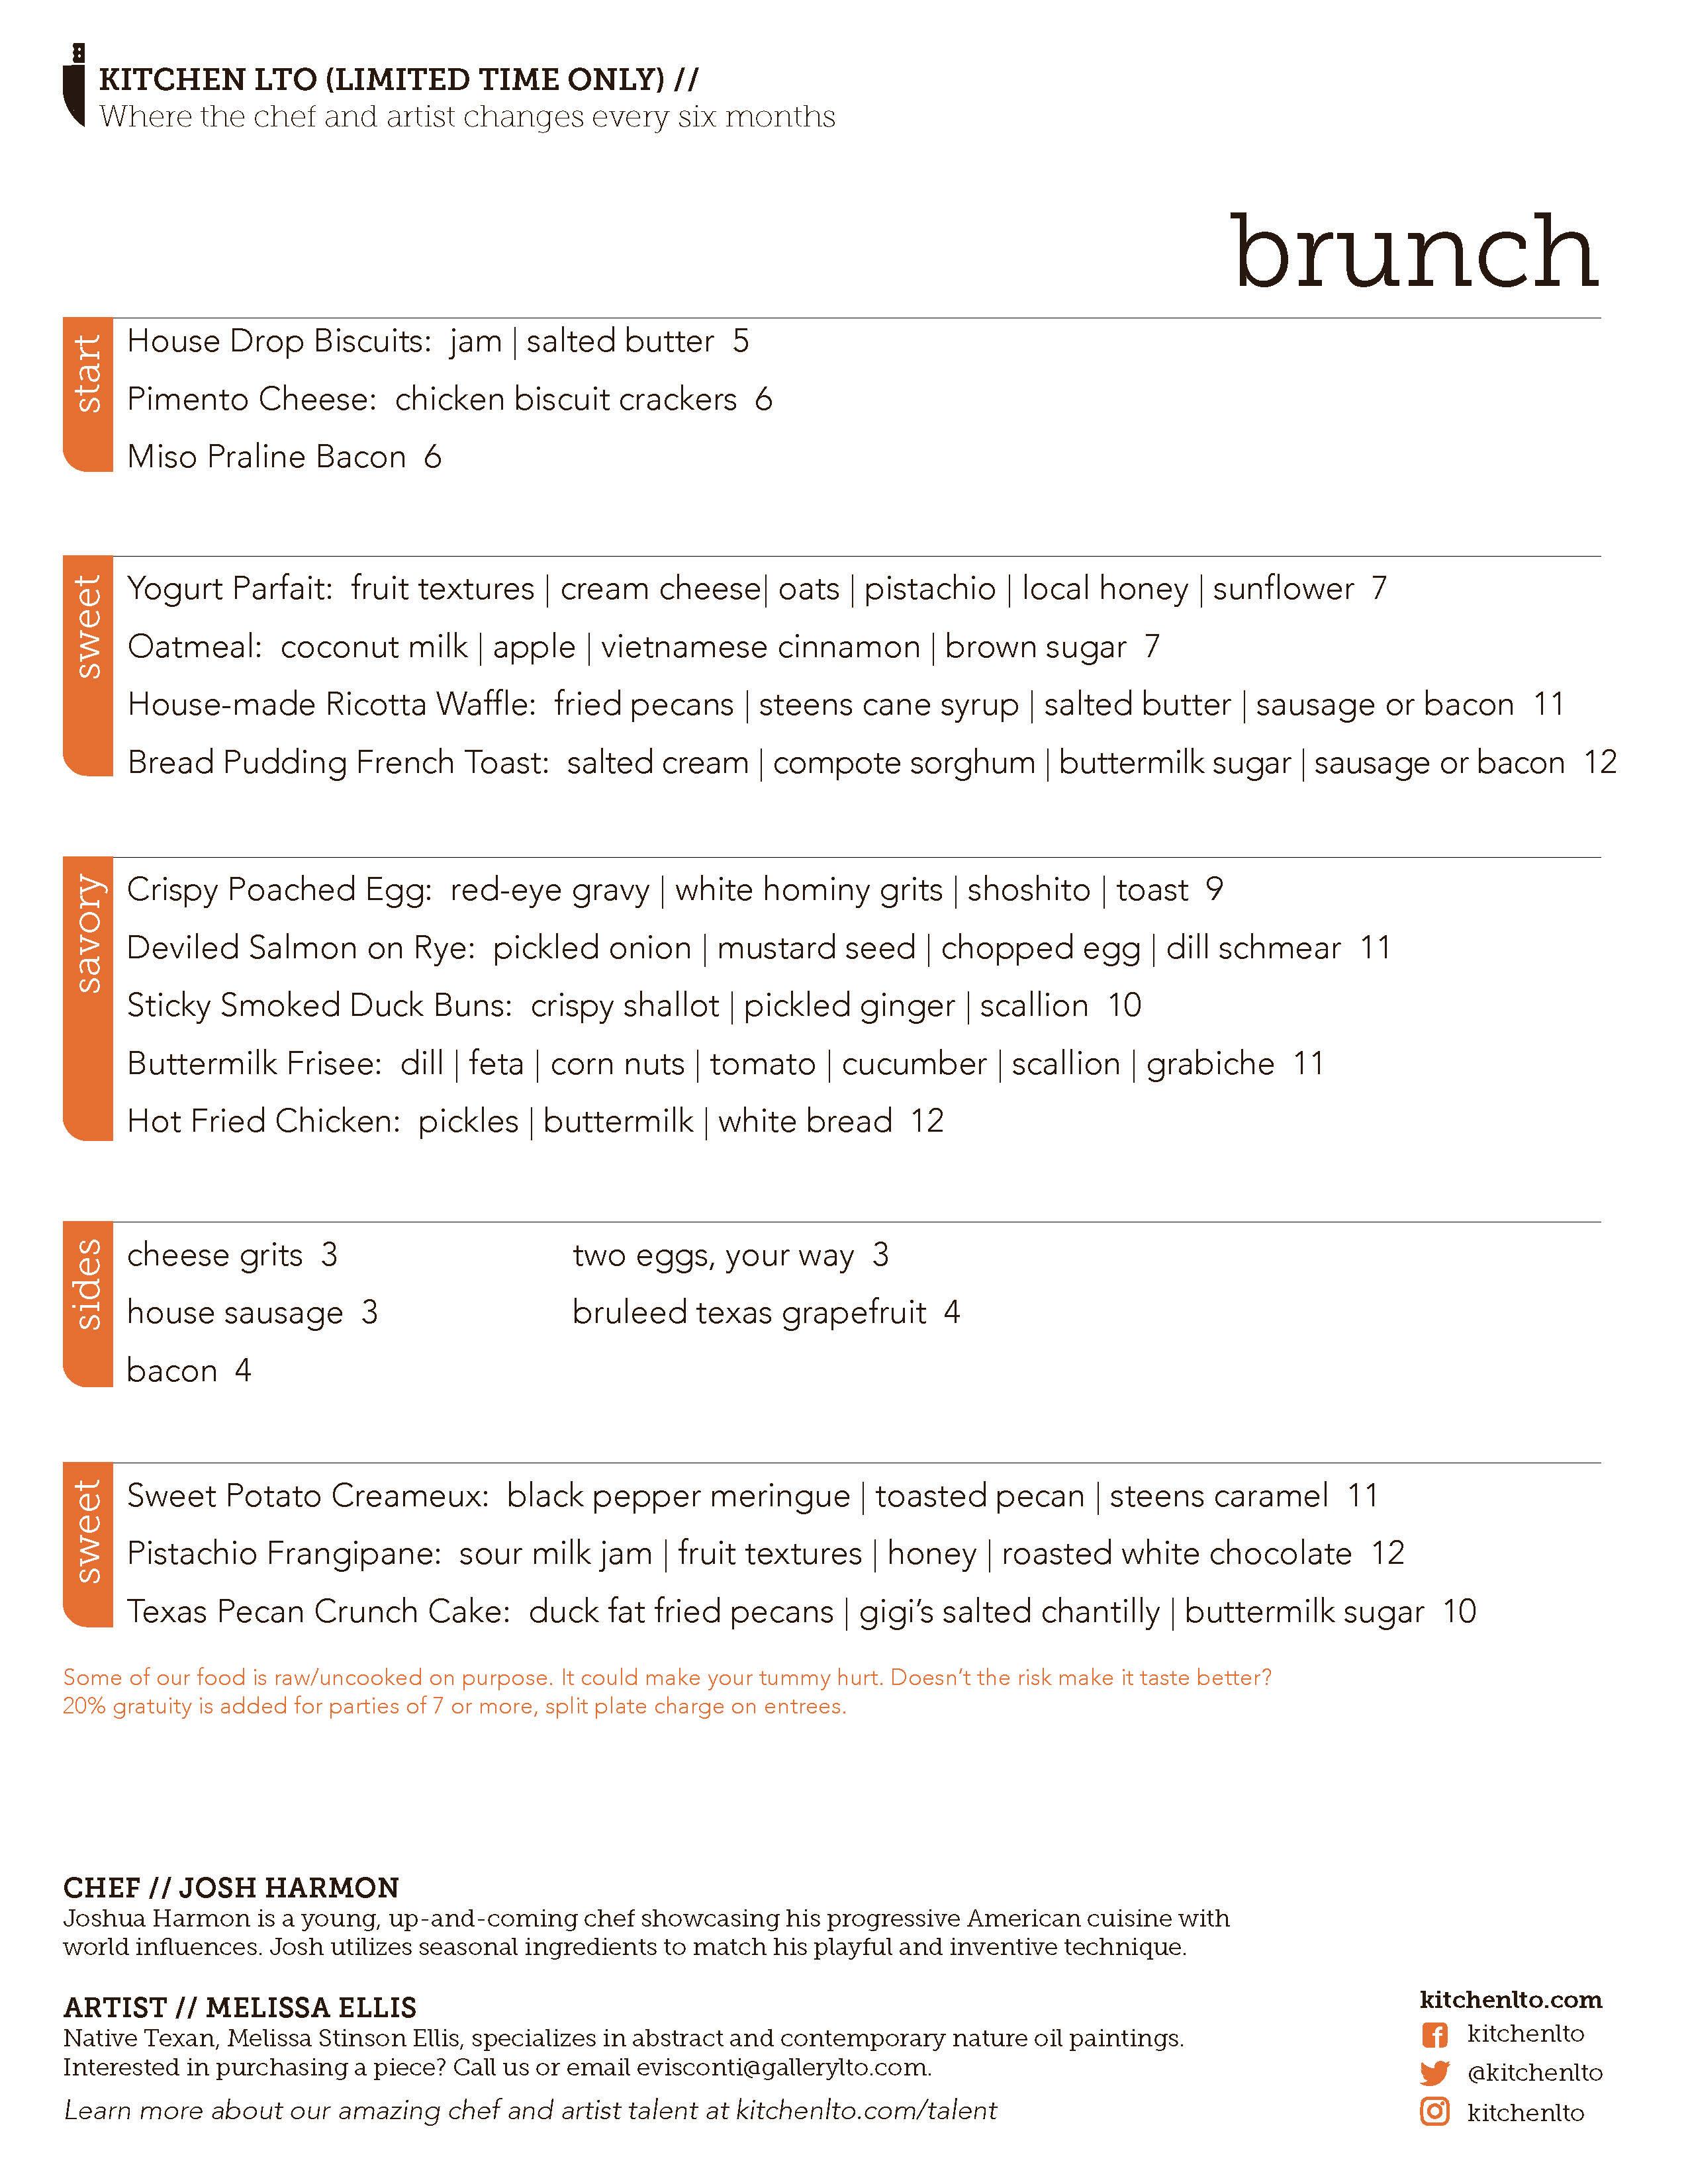 lto-brunch-menu